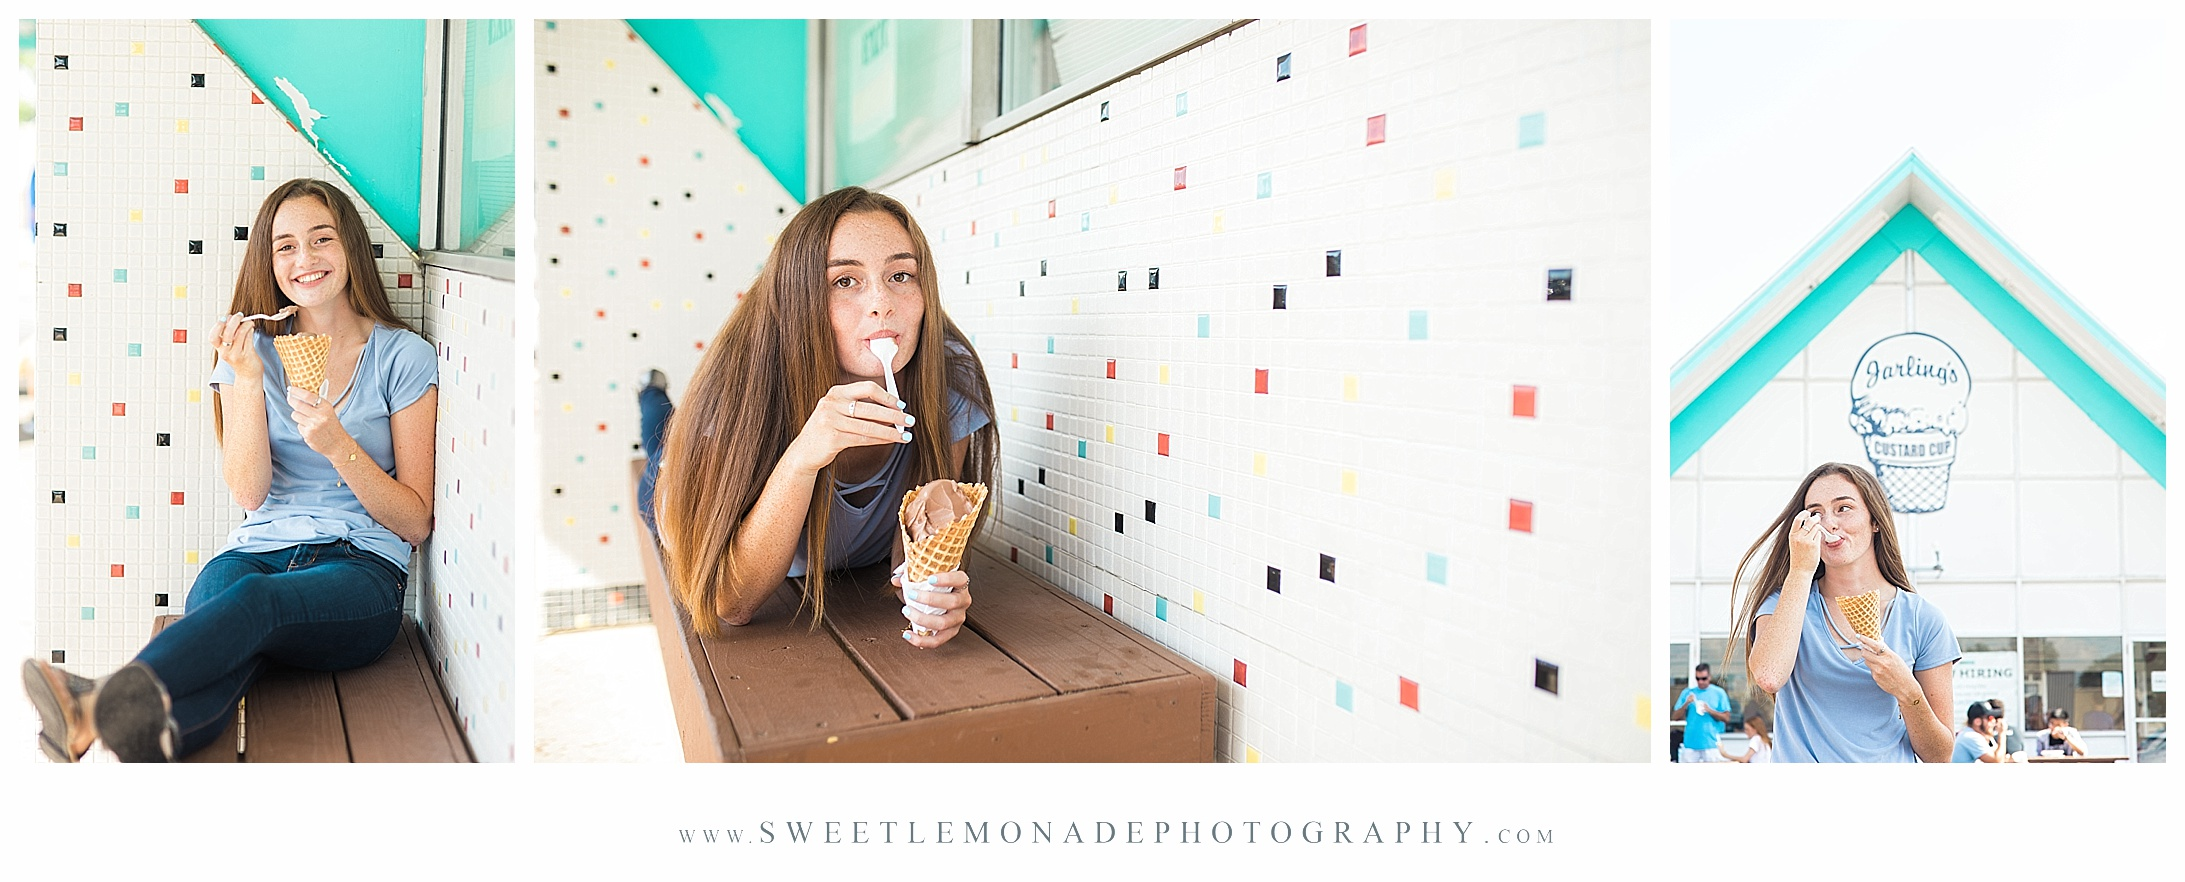 champaign-senior-photographer-sweet-lemonade-photography-st-thomas-more-high-school_2307.jpg